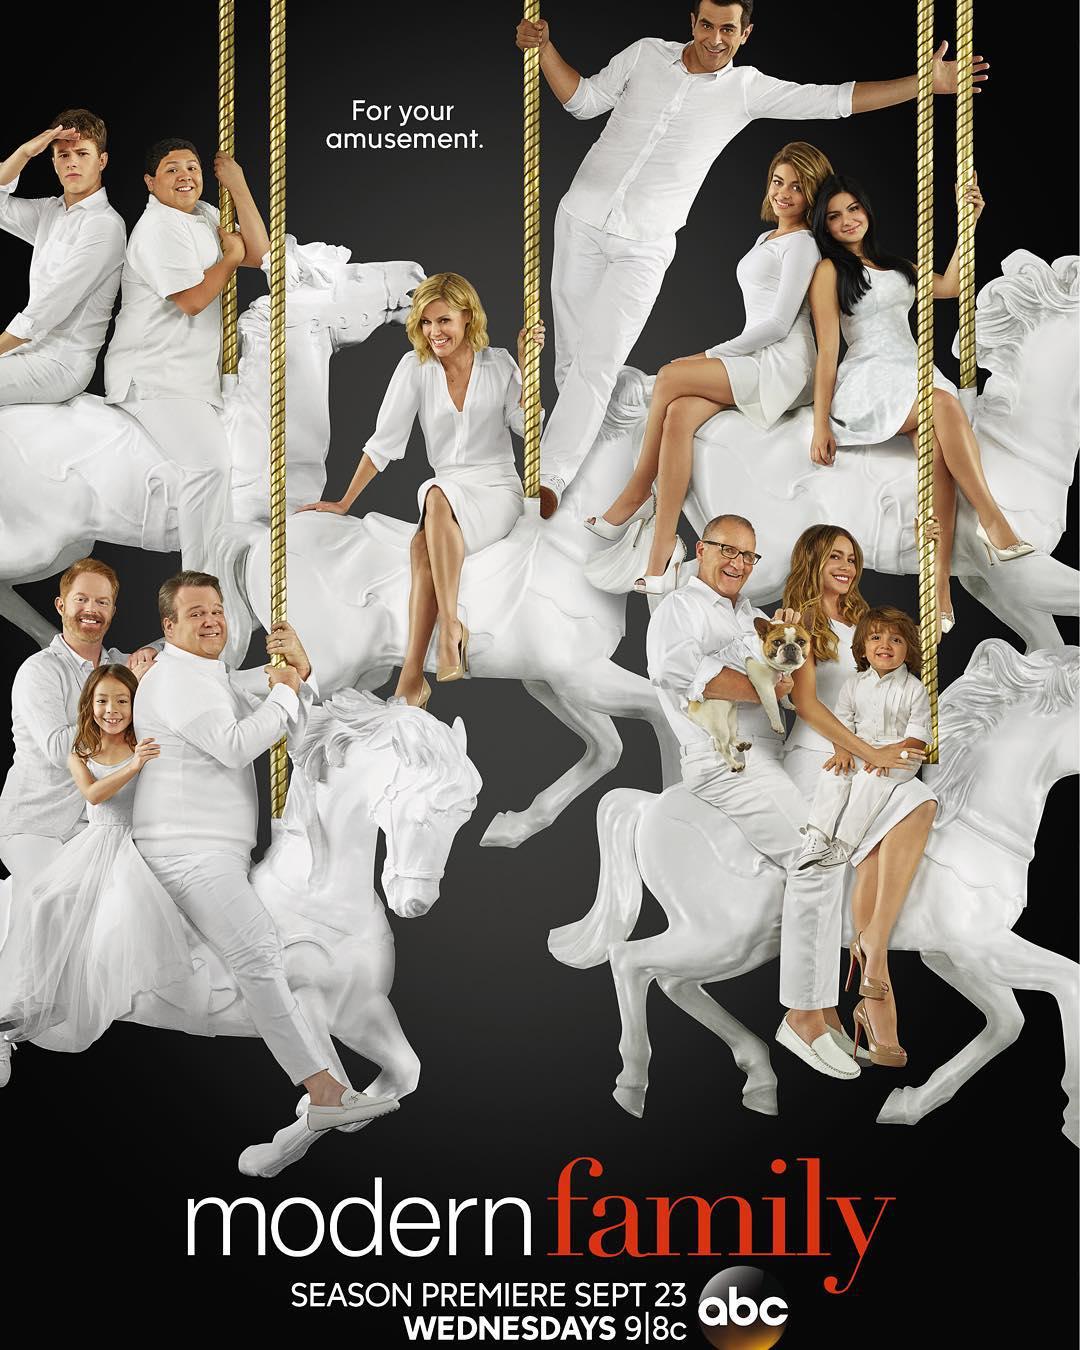 Modern Family funny poster